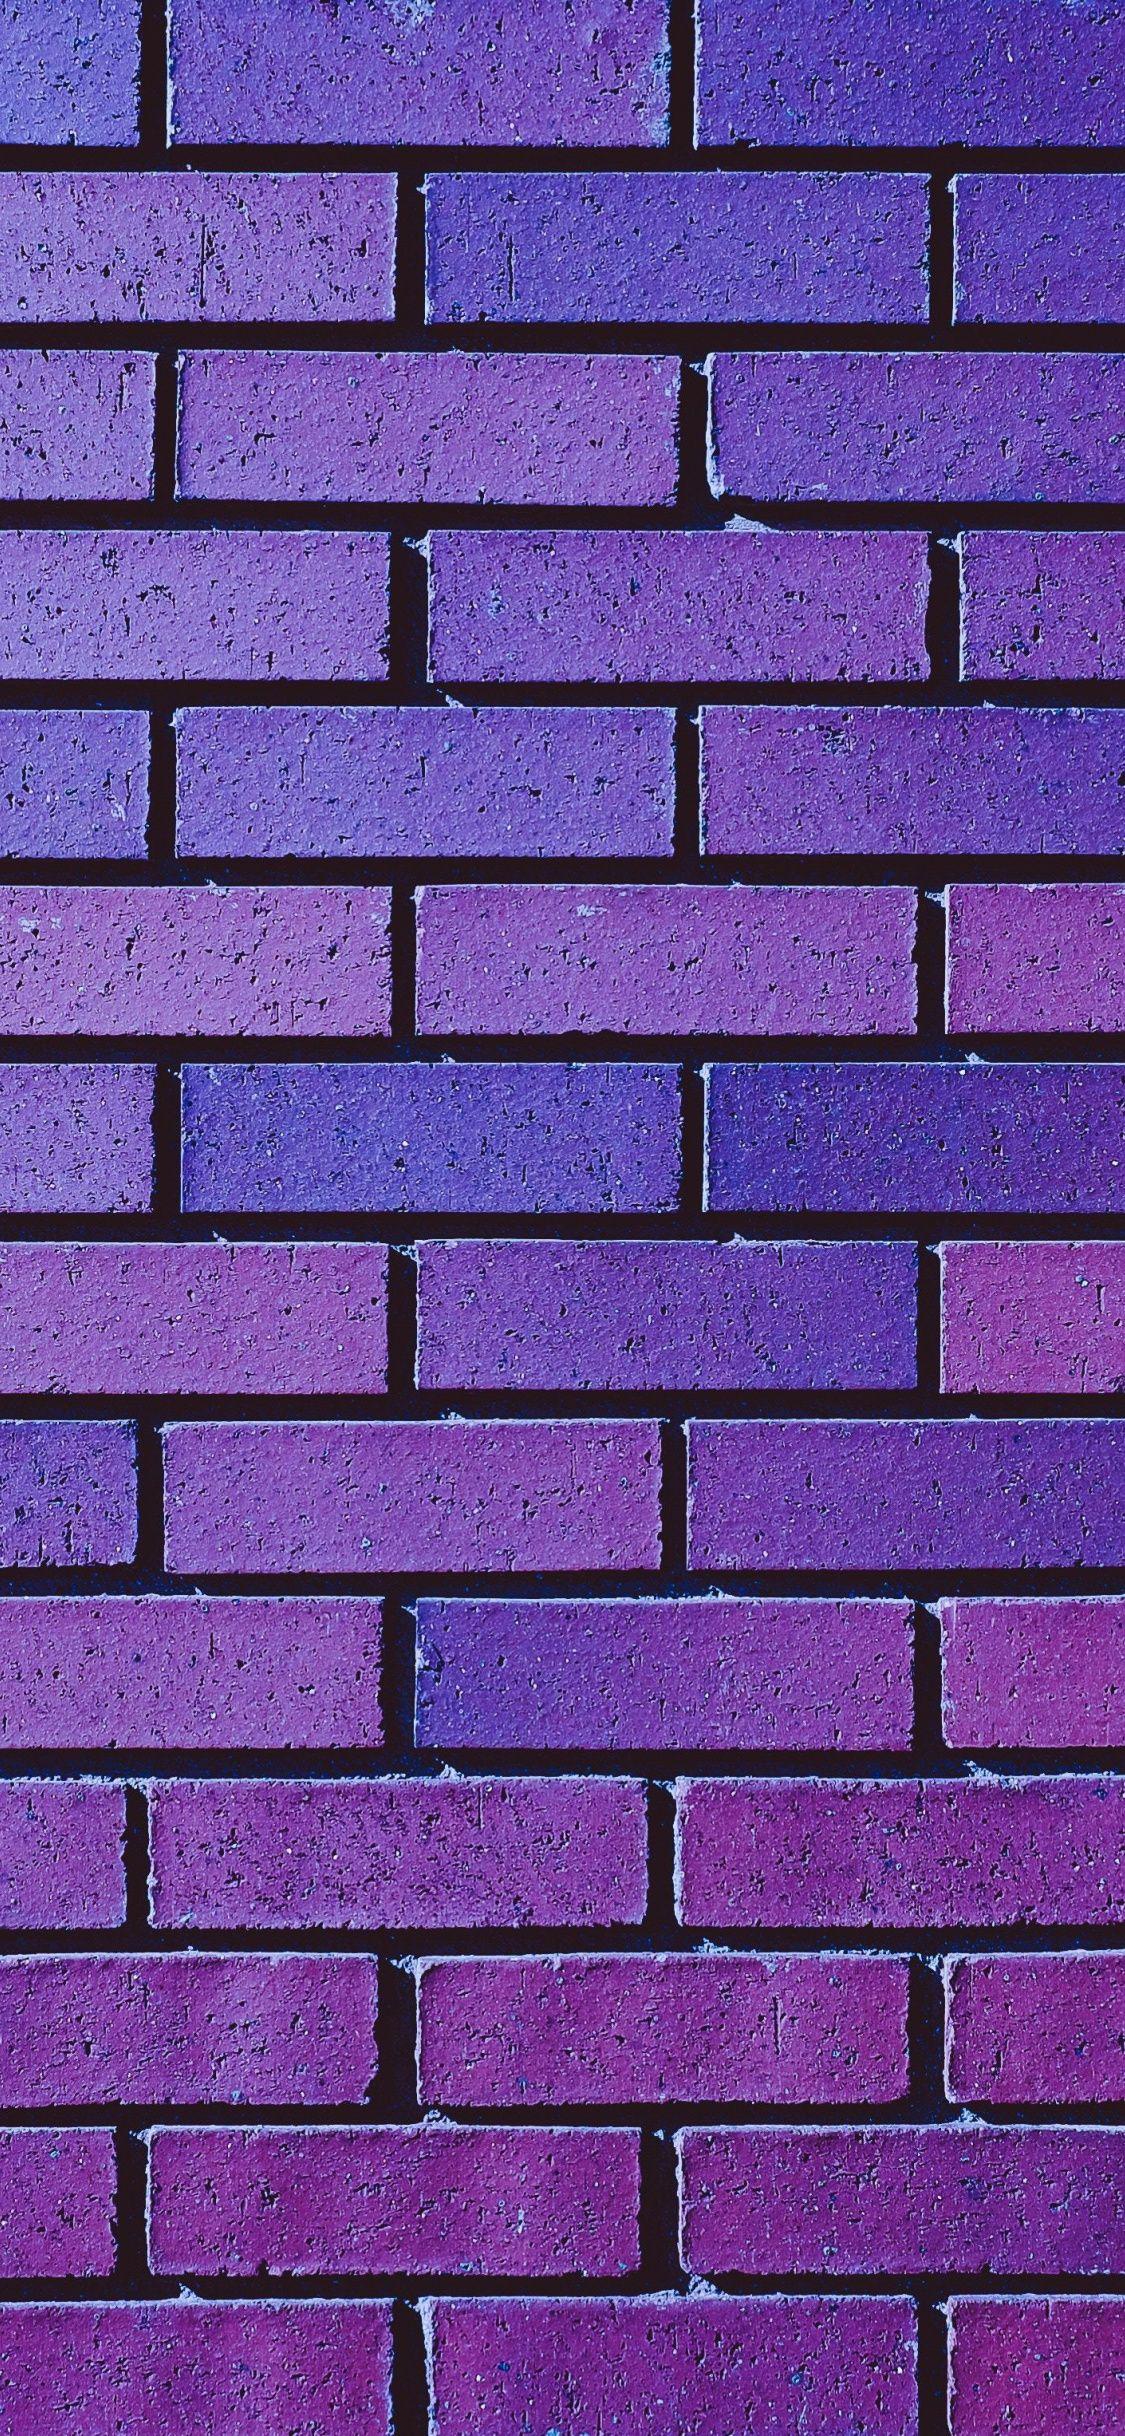 Violet wall, bricks, pattern, 1125x2436 wallpaper